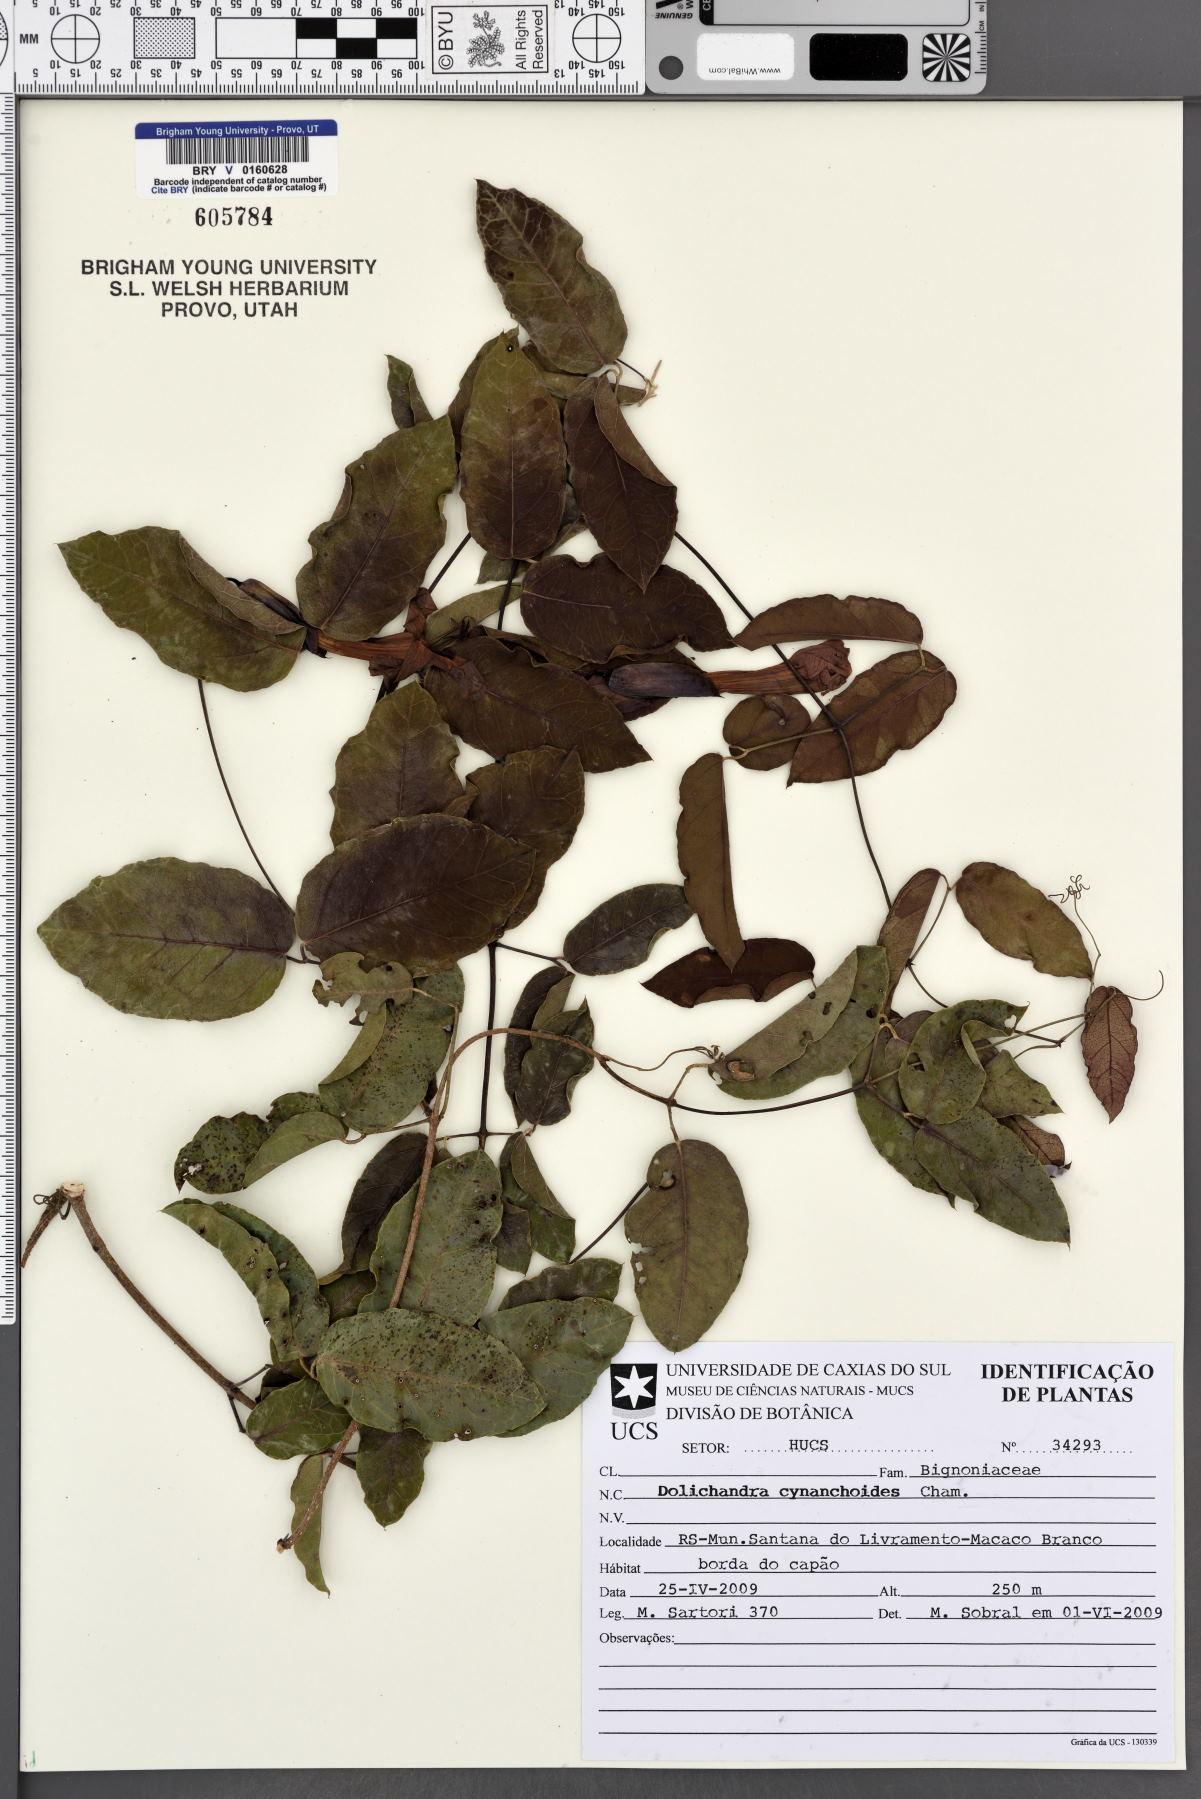 Dolichandra cynanchoides image